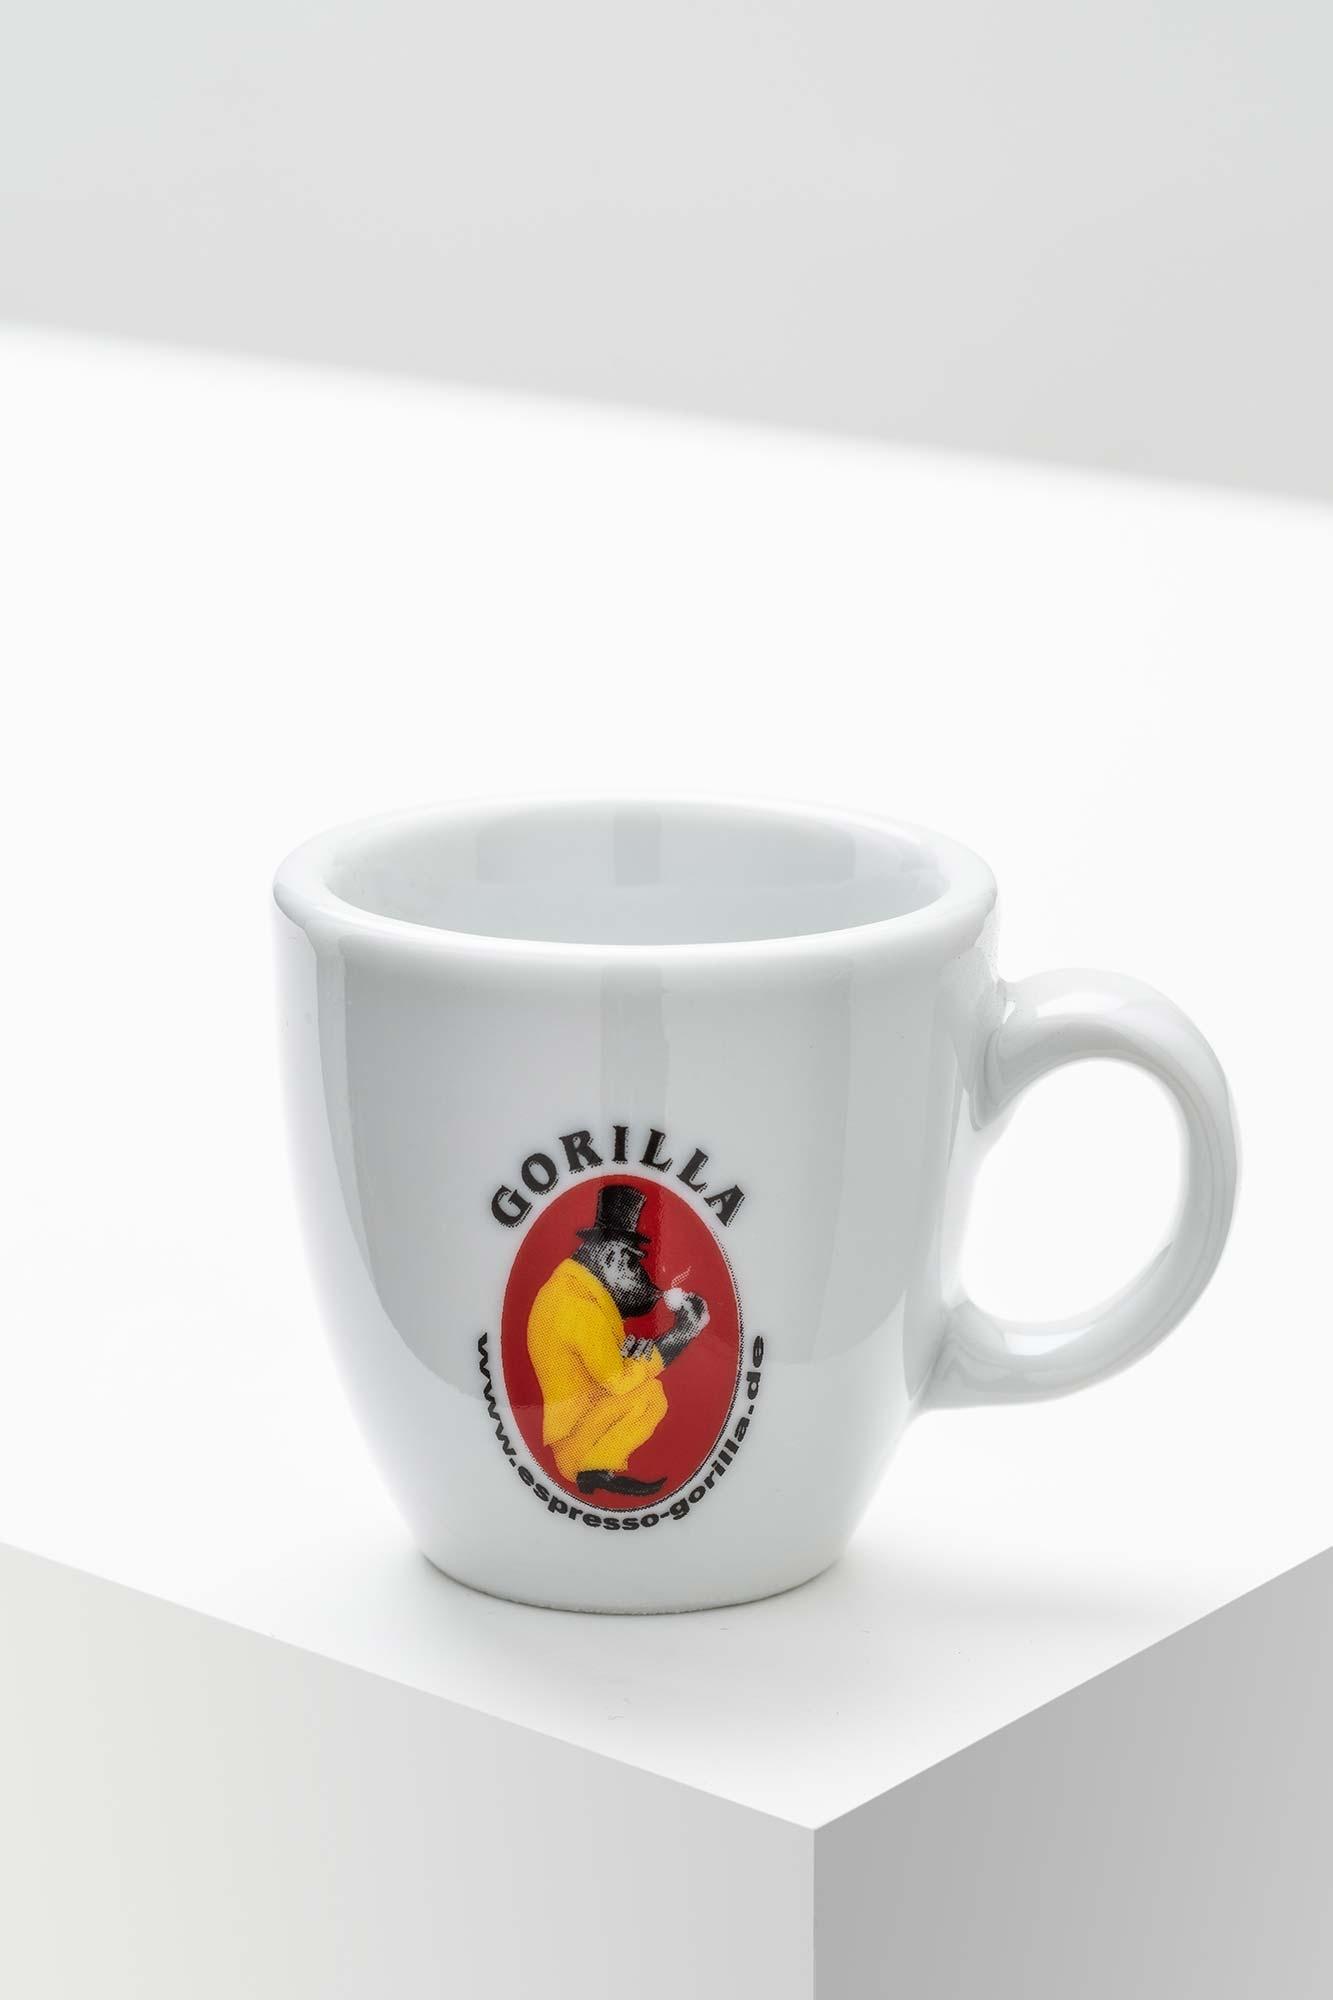 gorilla espresso tasse online kaufen roast market. Black Bedroom Furniture Sets. Home Design Ideas